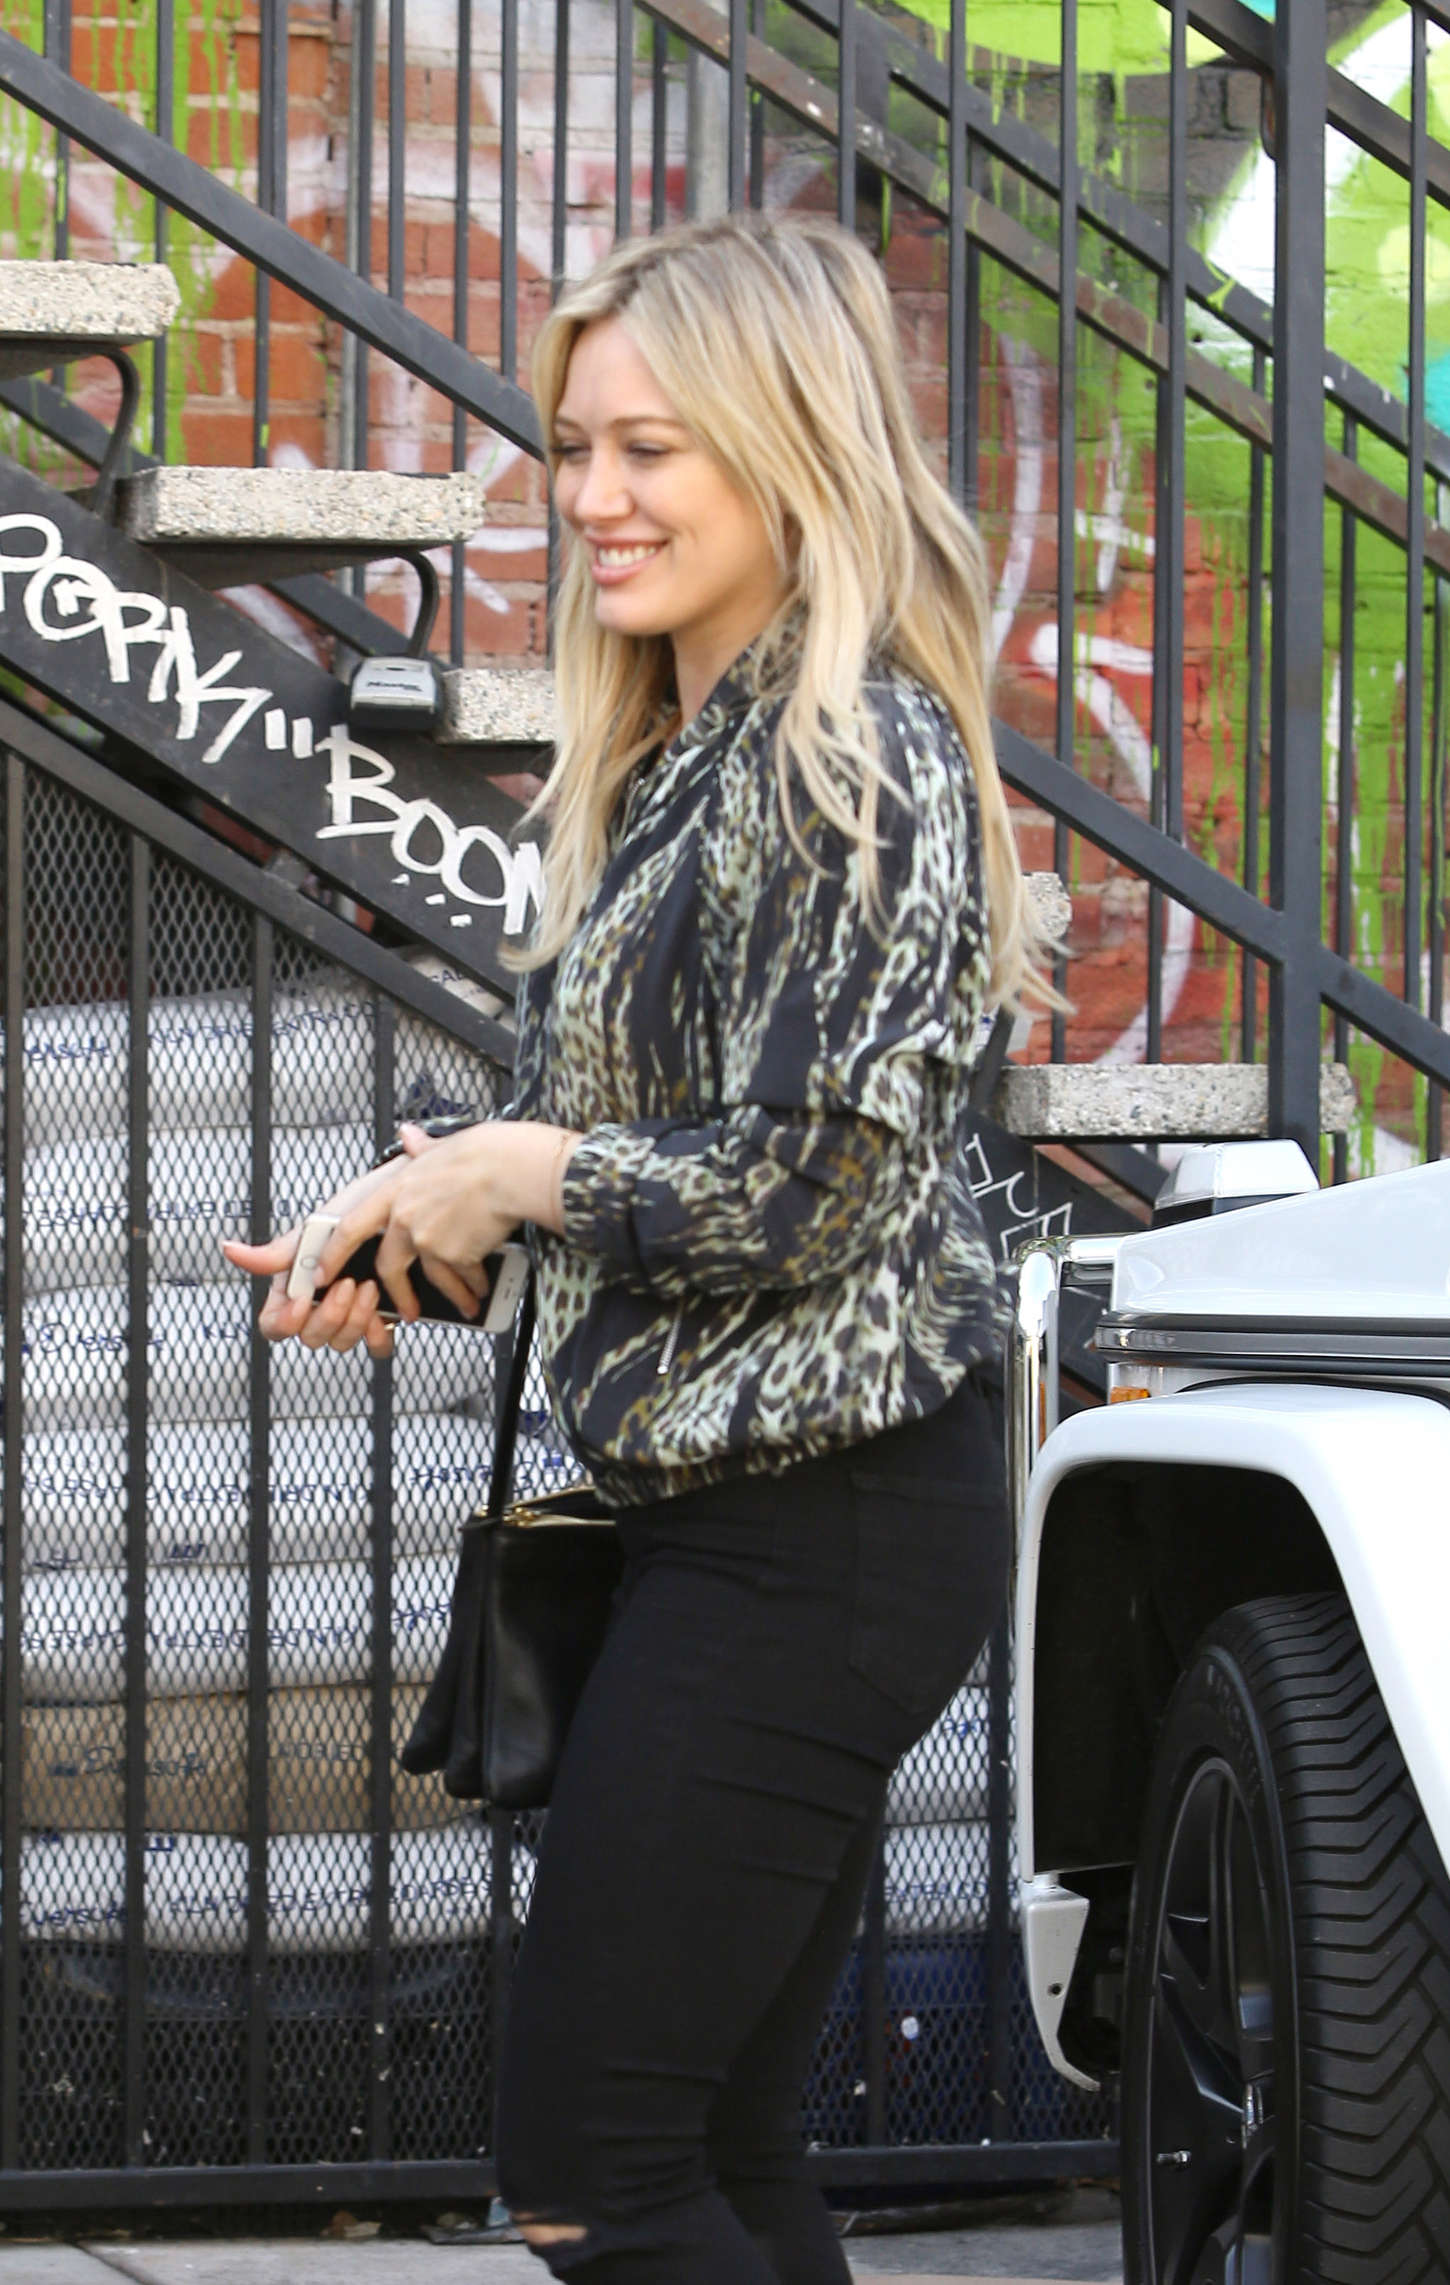 Hilary Duff Booty in Jeans Out in LA